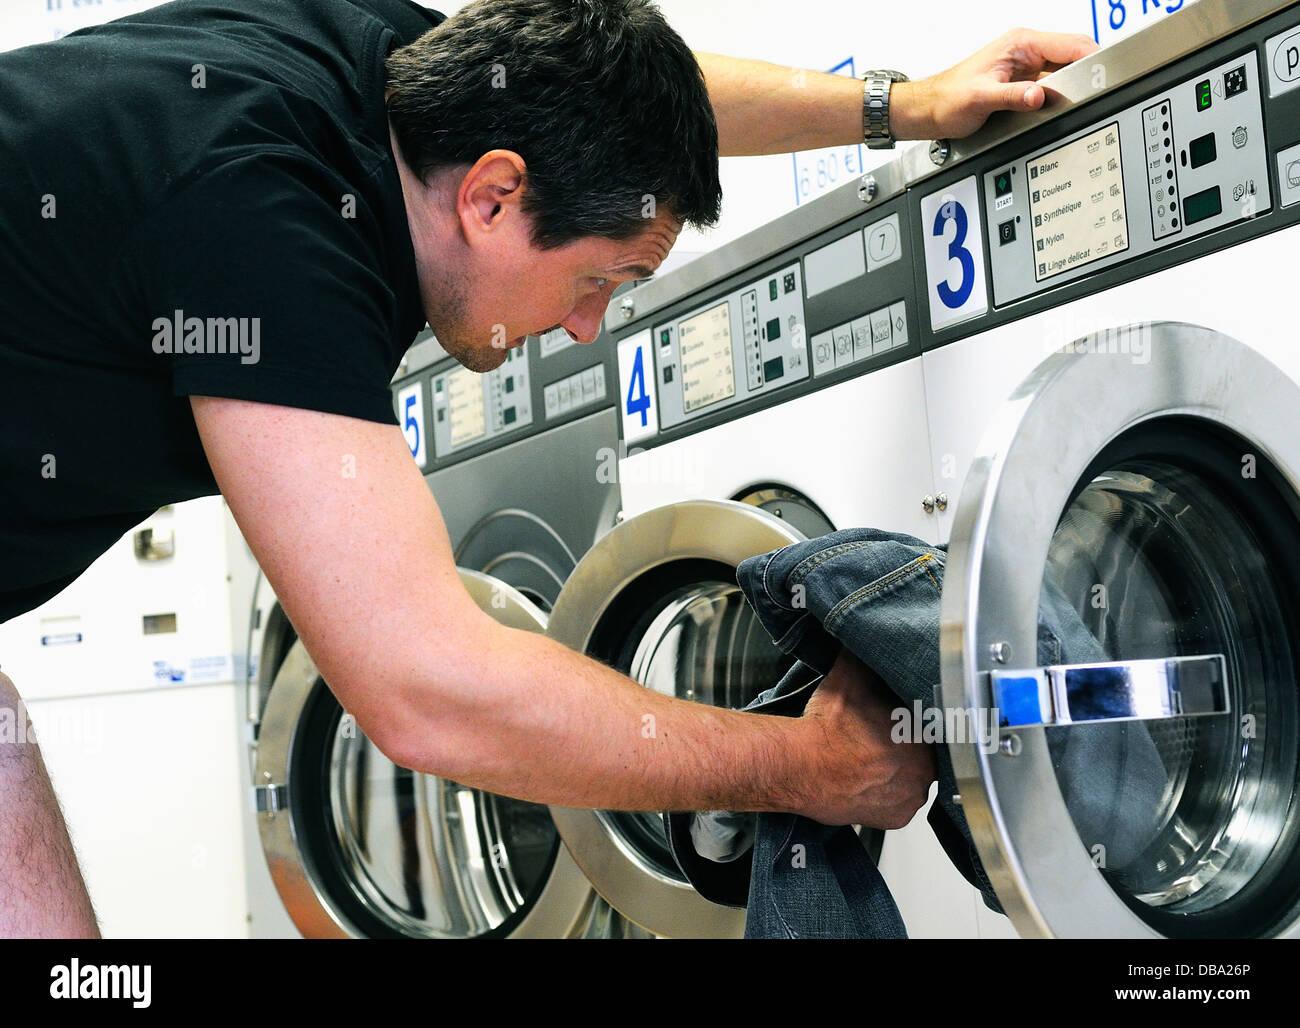 landromat service - Stock Image